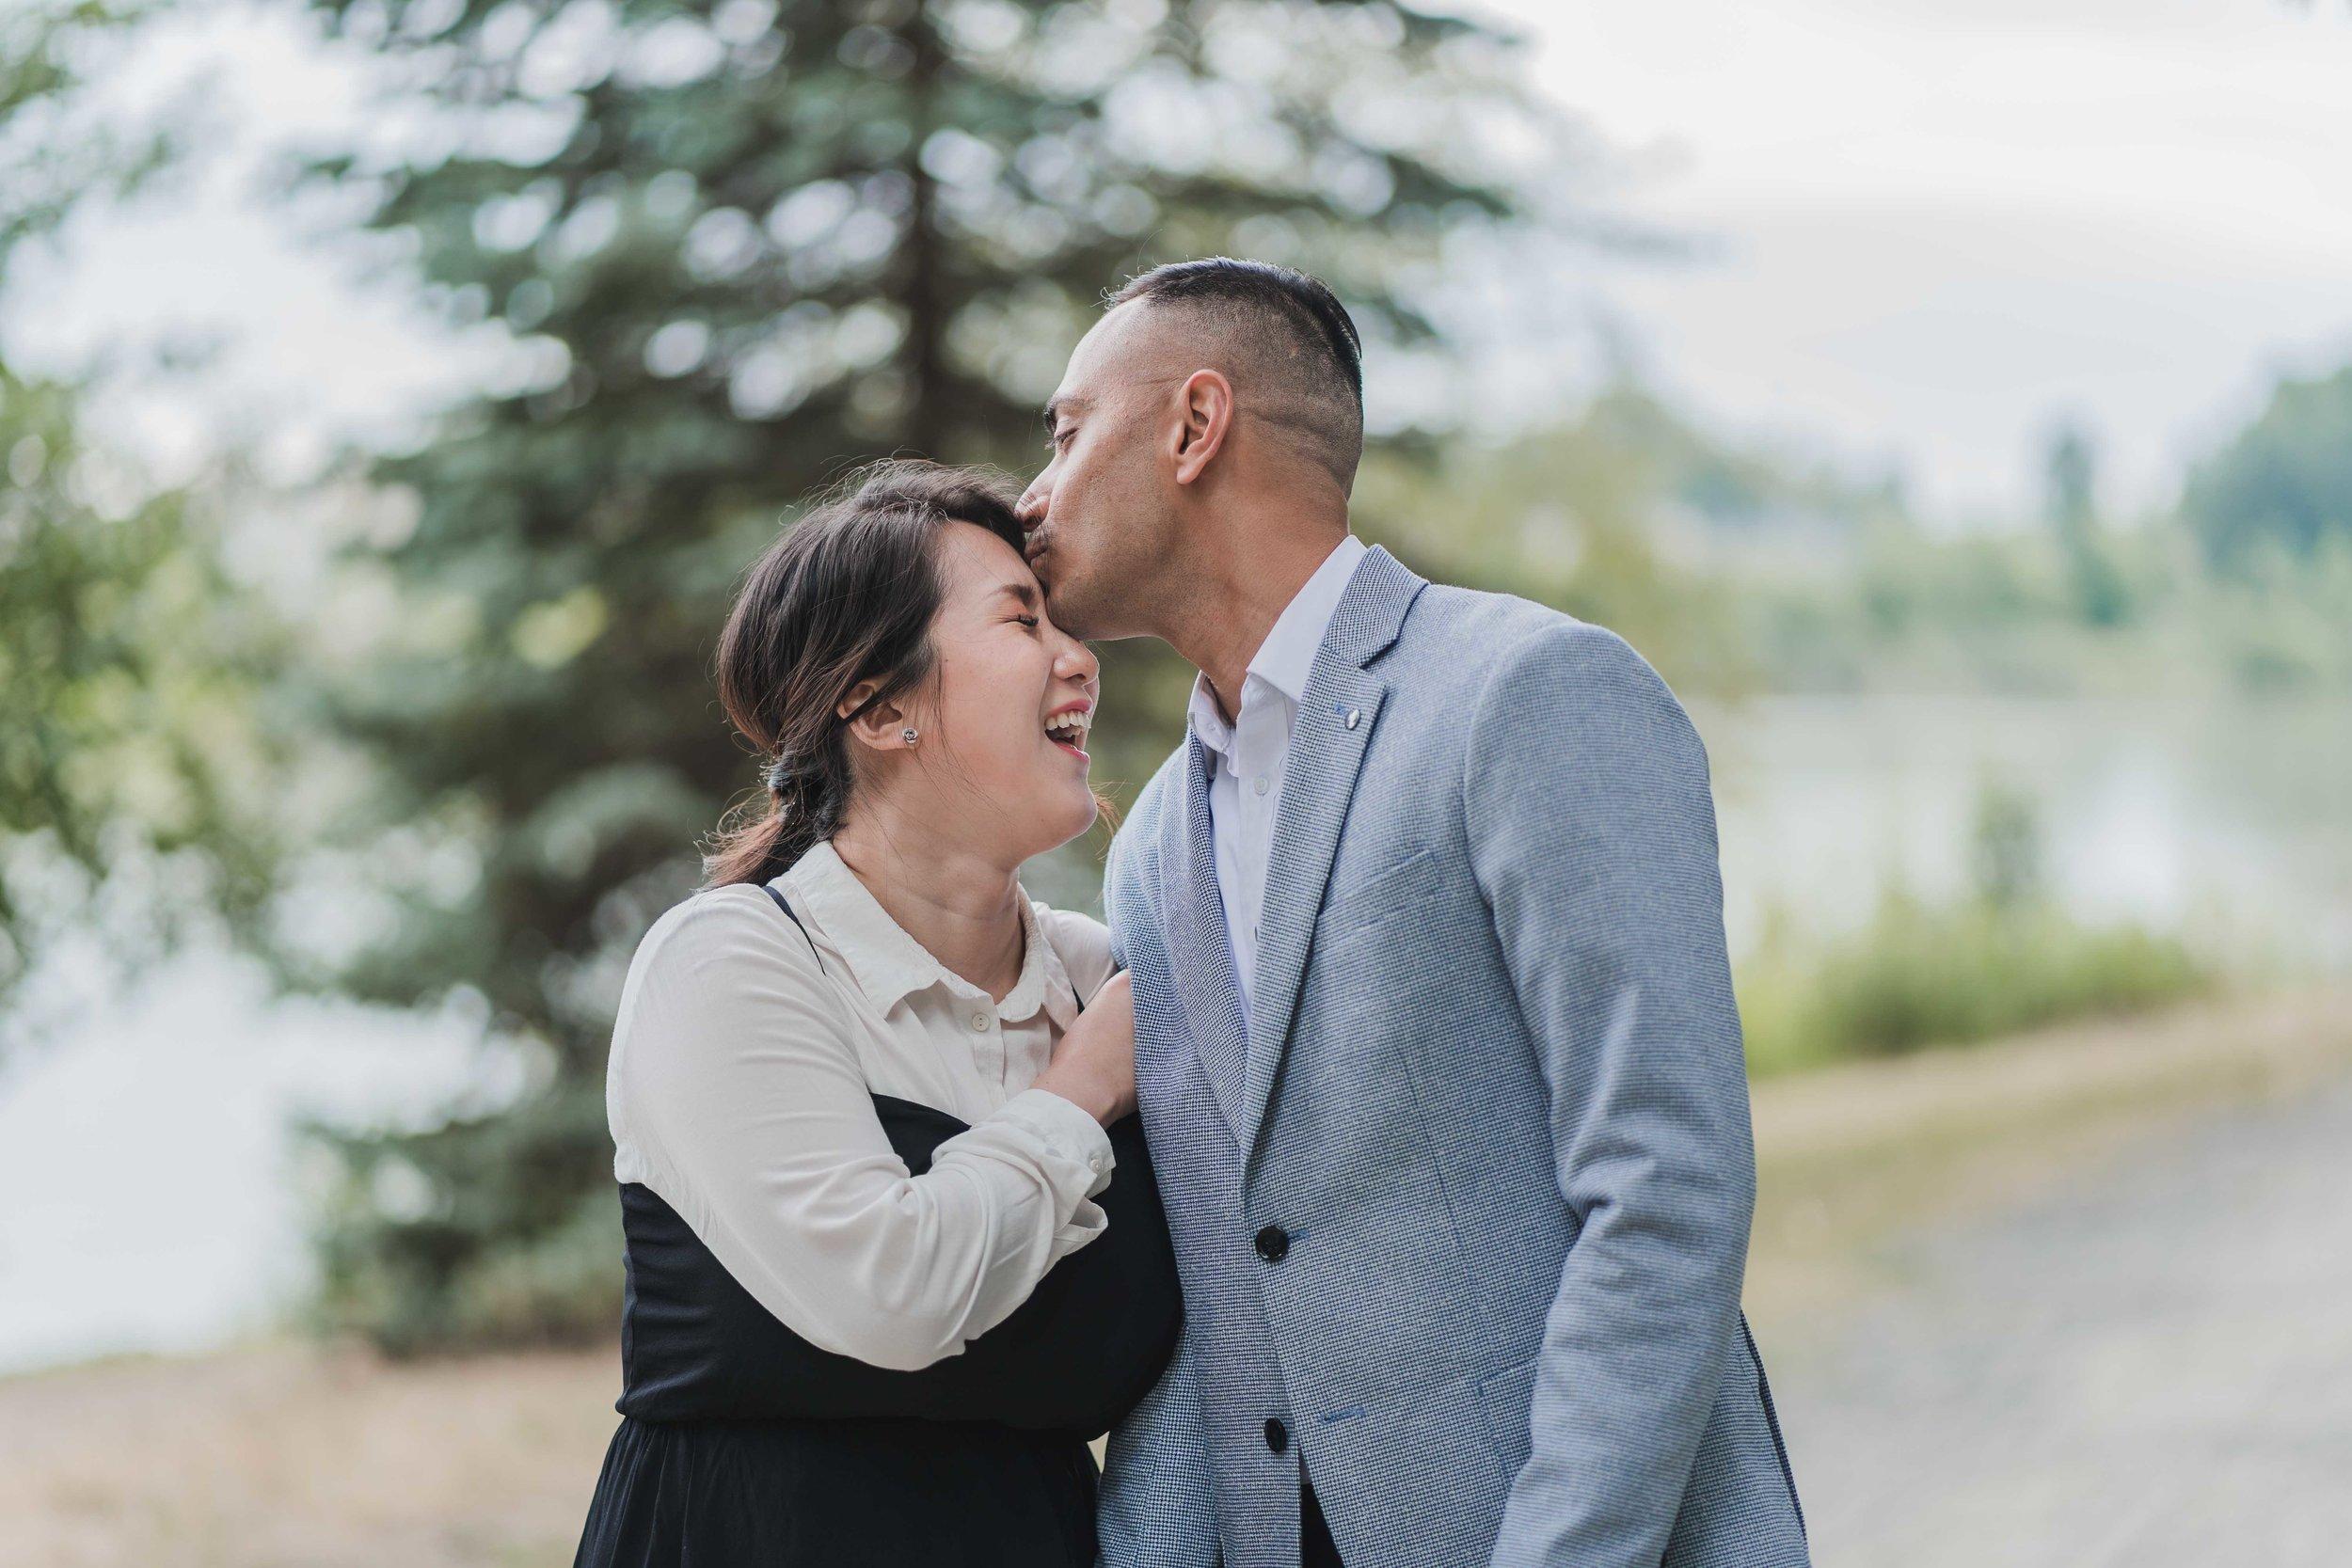 20190622 - Monika & Johnson Engagement - 0093.jpg